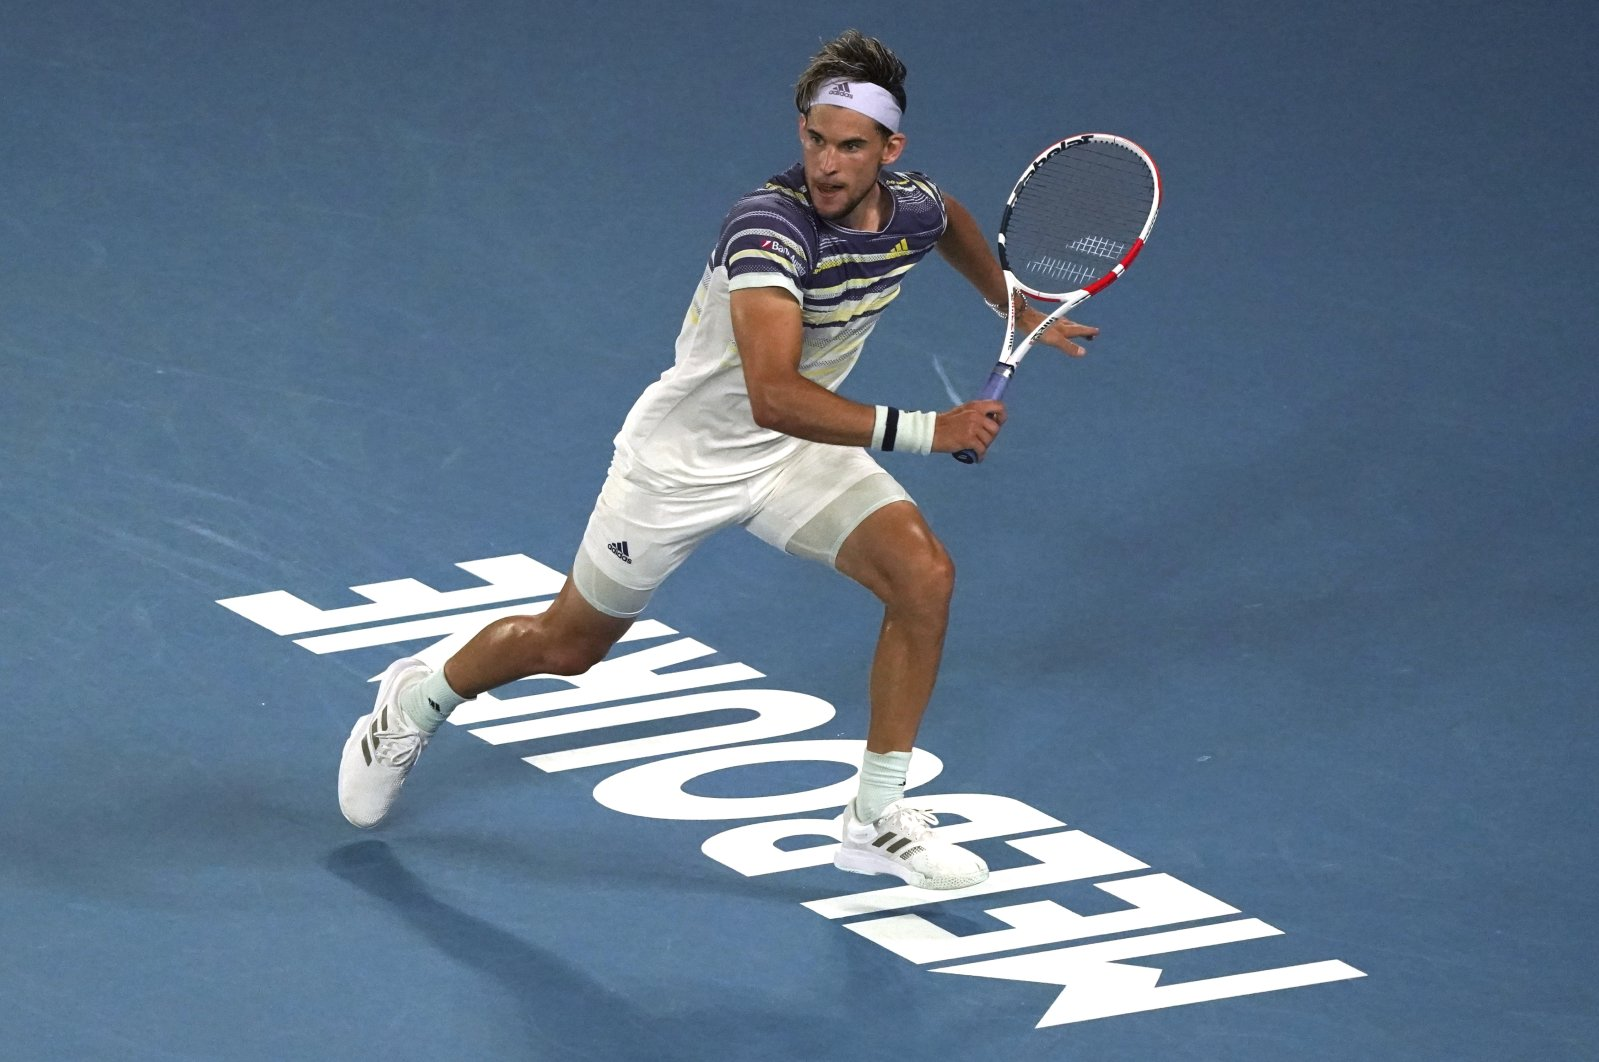 Dominic Thiem in action during an Australian Open quarterfinal match, in Melbourne, Australia, Jan. 29, 2020. (AP Photo)